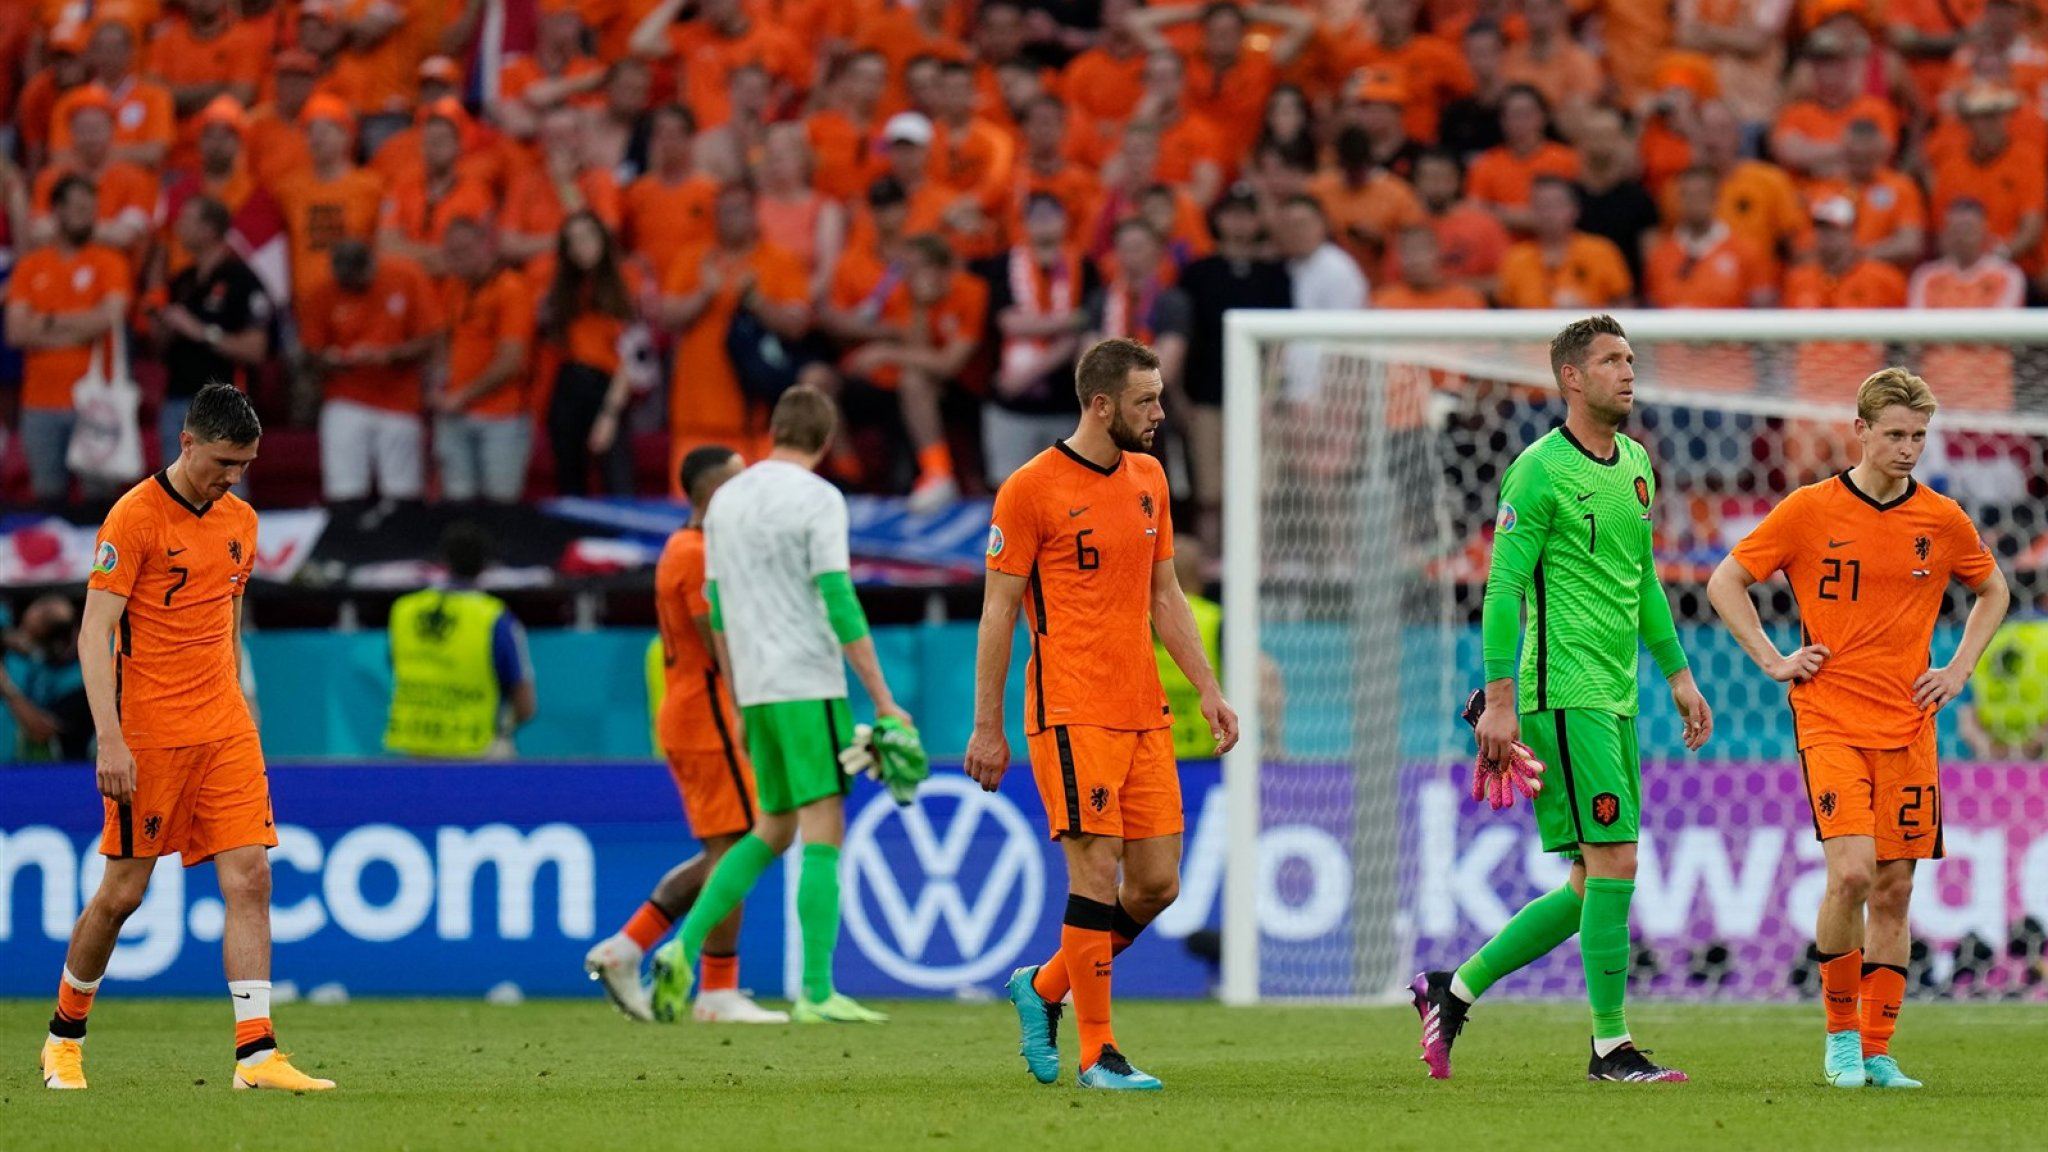 Louis van Gaal on the Dutch national team: 'A handful of glorified stars'